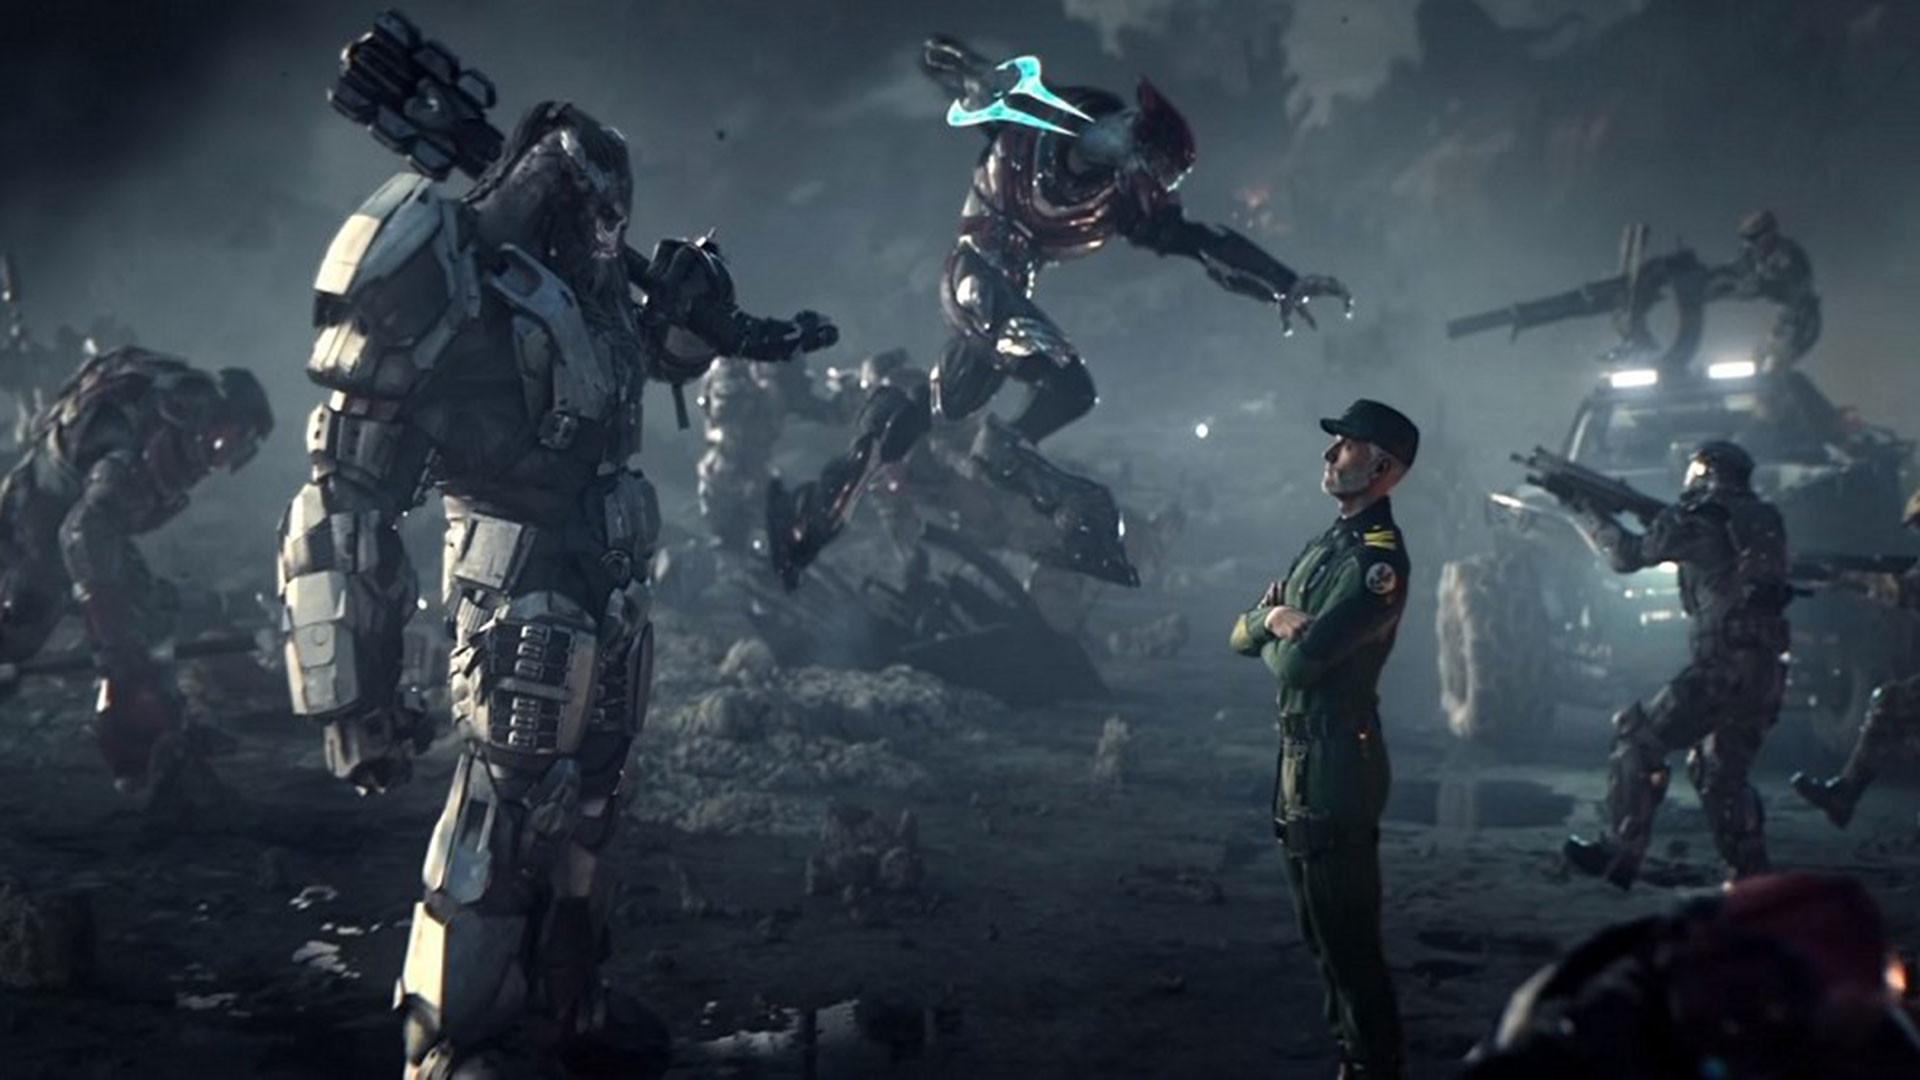 Halo Wars 2 4K Wallpaper   Halo Wars 2 1080p Wallpaper …